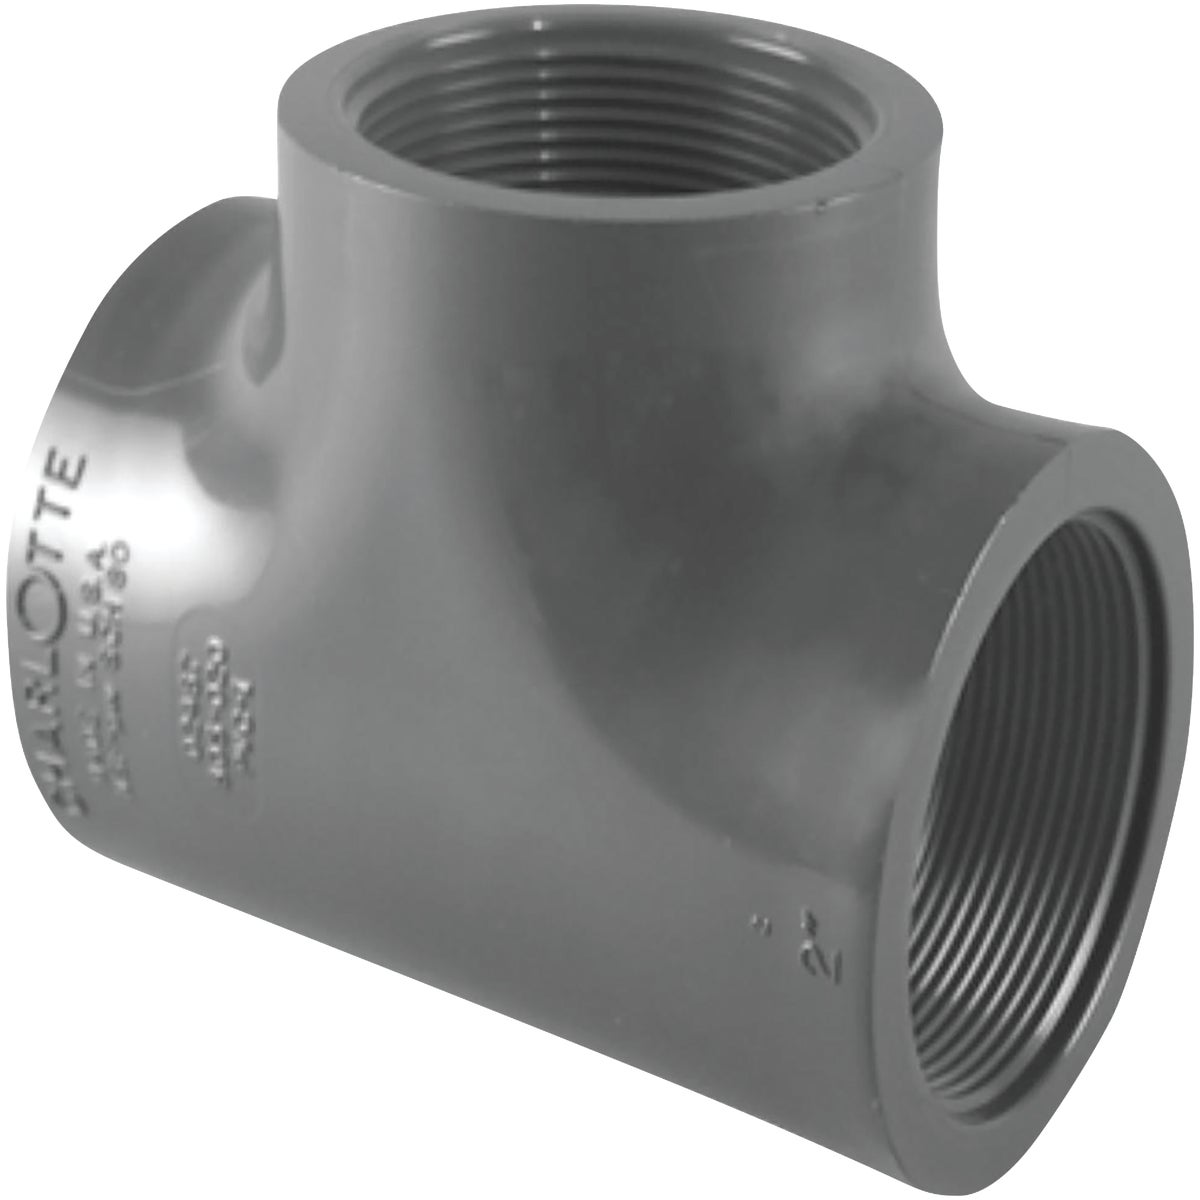 "1"" SCH80 PVC FXFXF TEE"